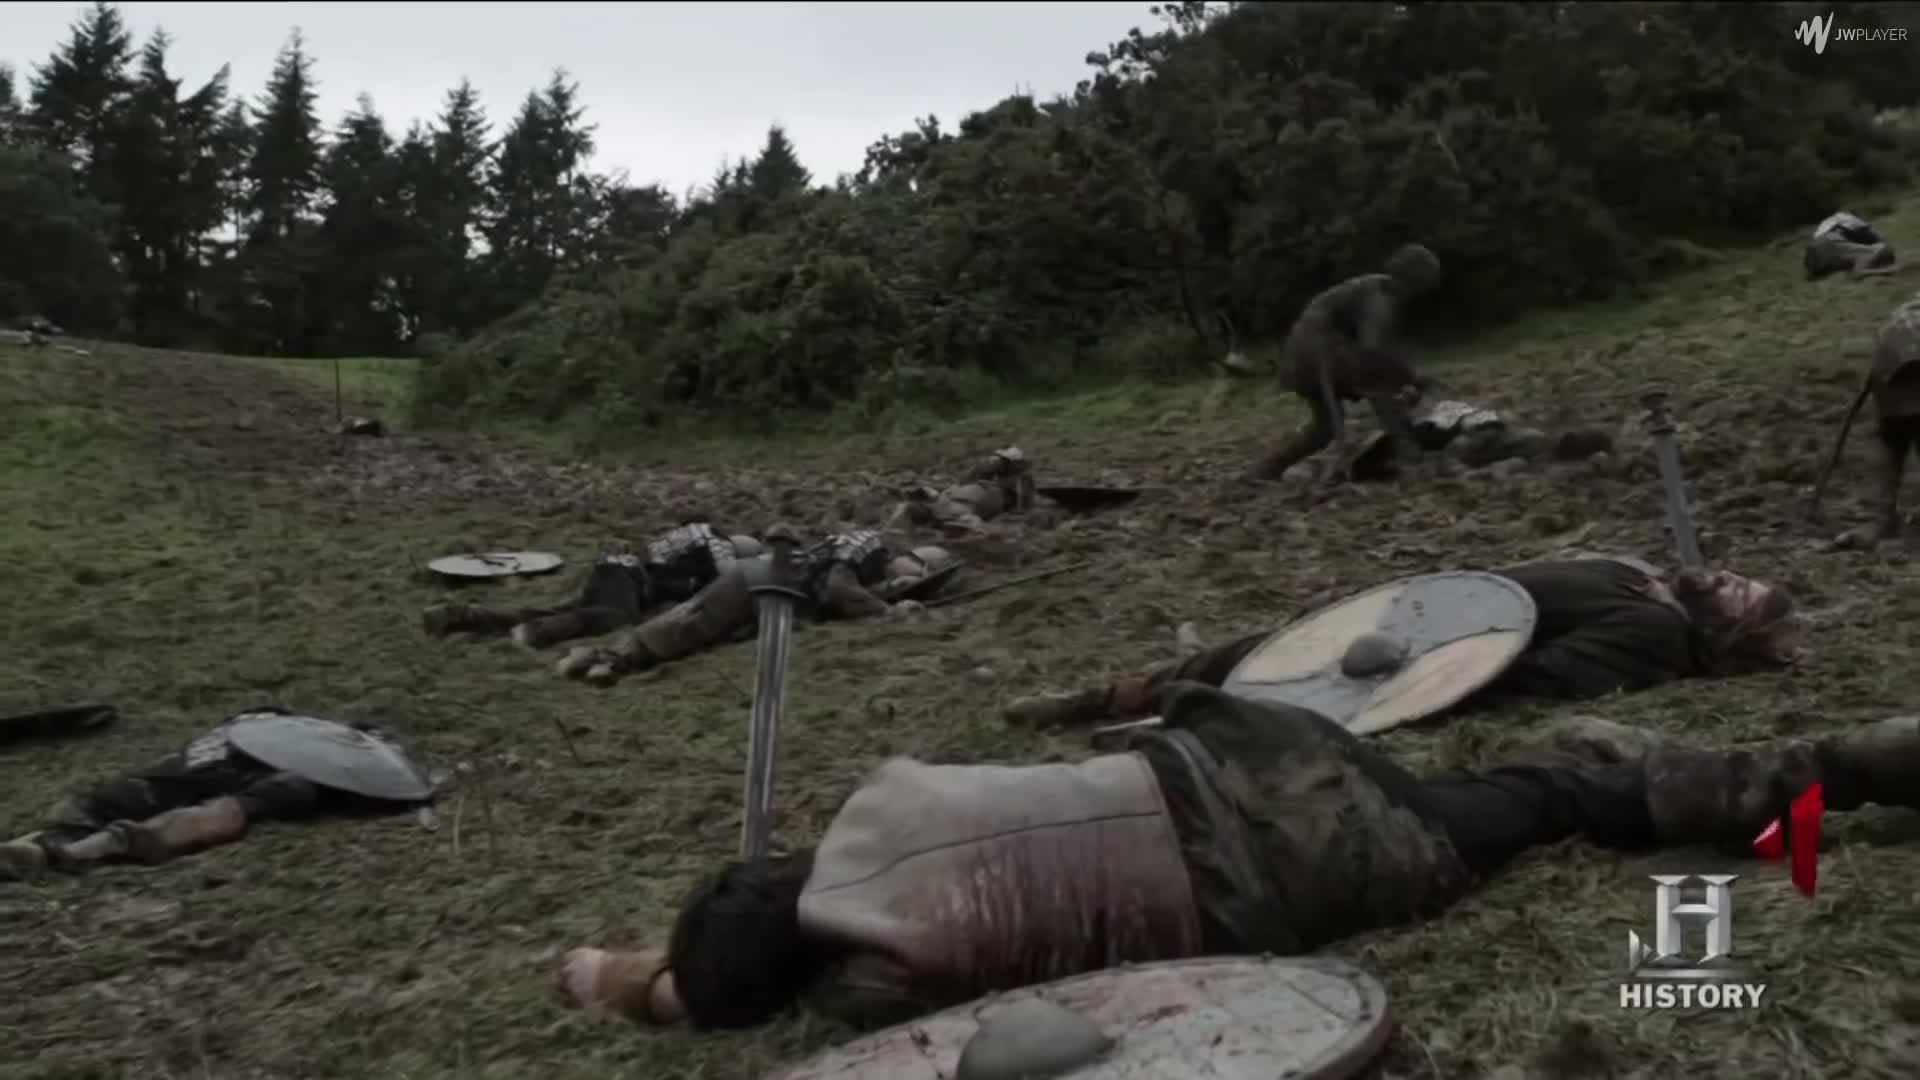 Battle, Danes, Denmark, England, King Aella, Norse, Northmen, Northumbria, Saxons, War, King Aella Attacks The Vikings Camp Despite Their Deal - THE VIKINGS SEASON 1 GIFs